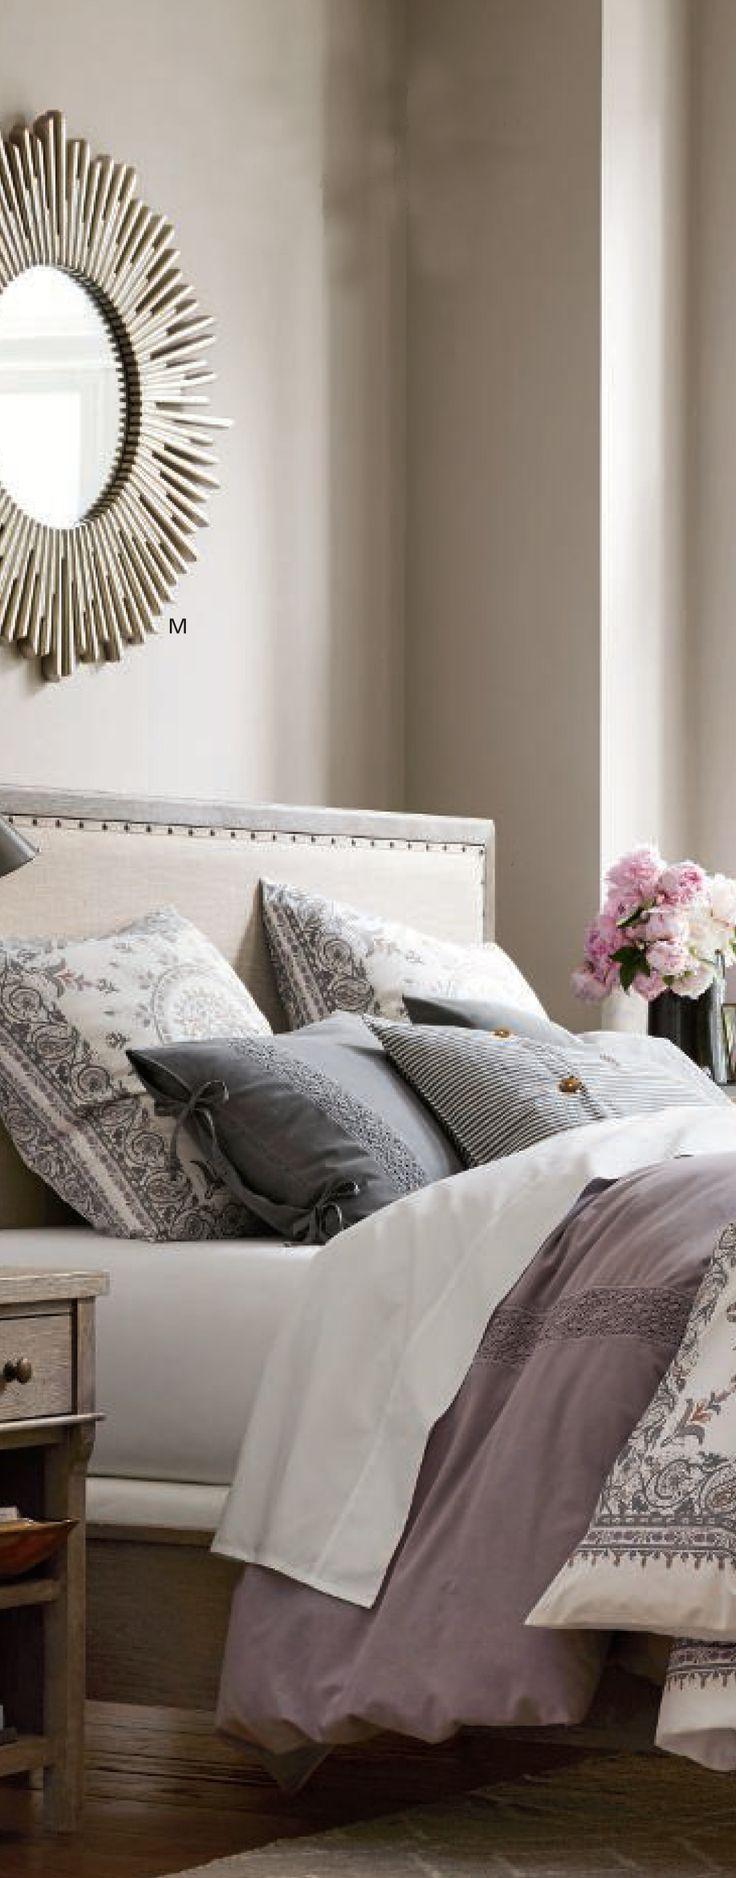 598 Best Luxury Bedding Sets Images On Pinterest